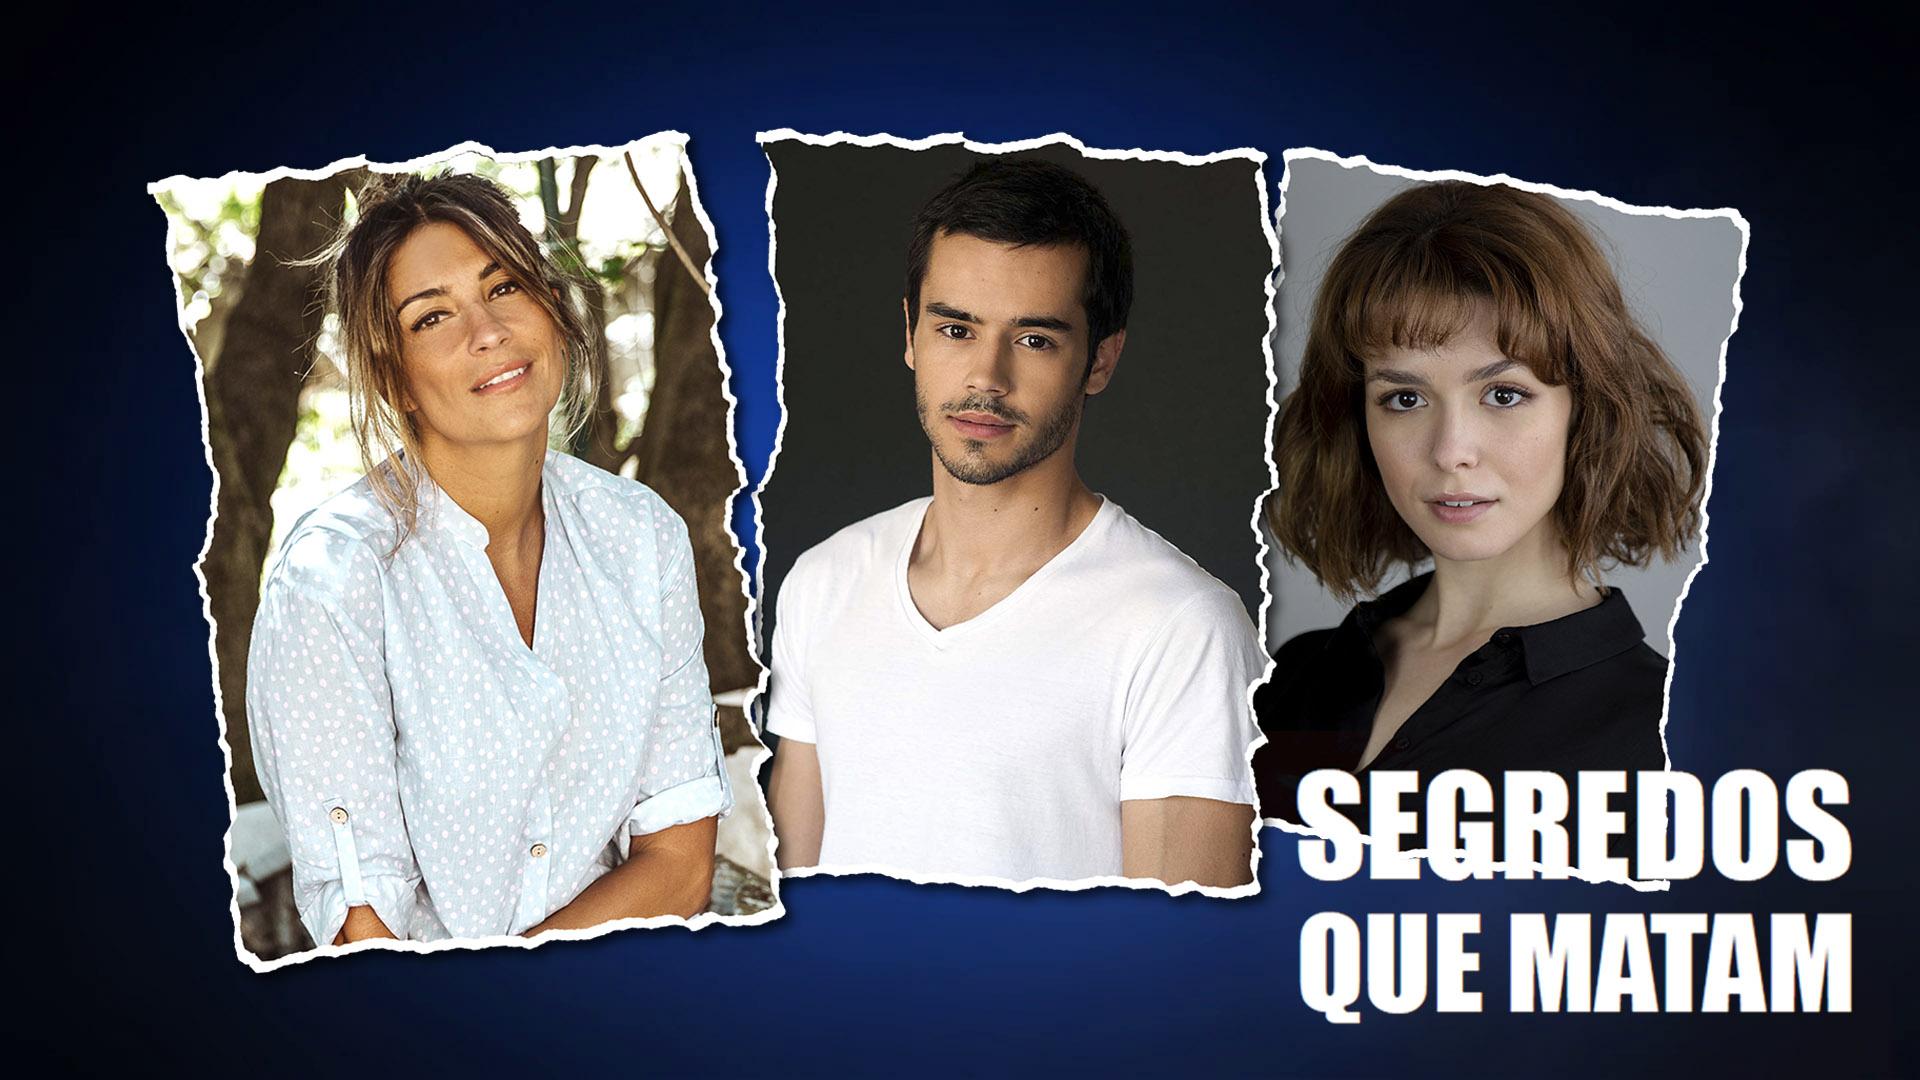 """Segredos que Matam"" com Isabel Figueira, Gonçalo Norton e Beatriz Barosa"